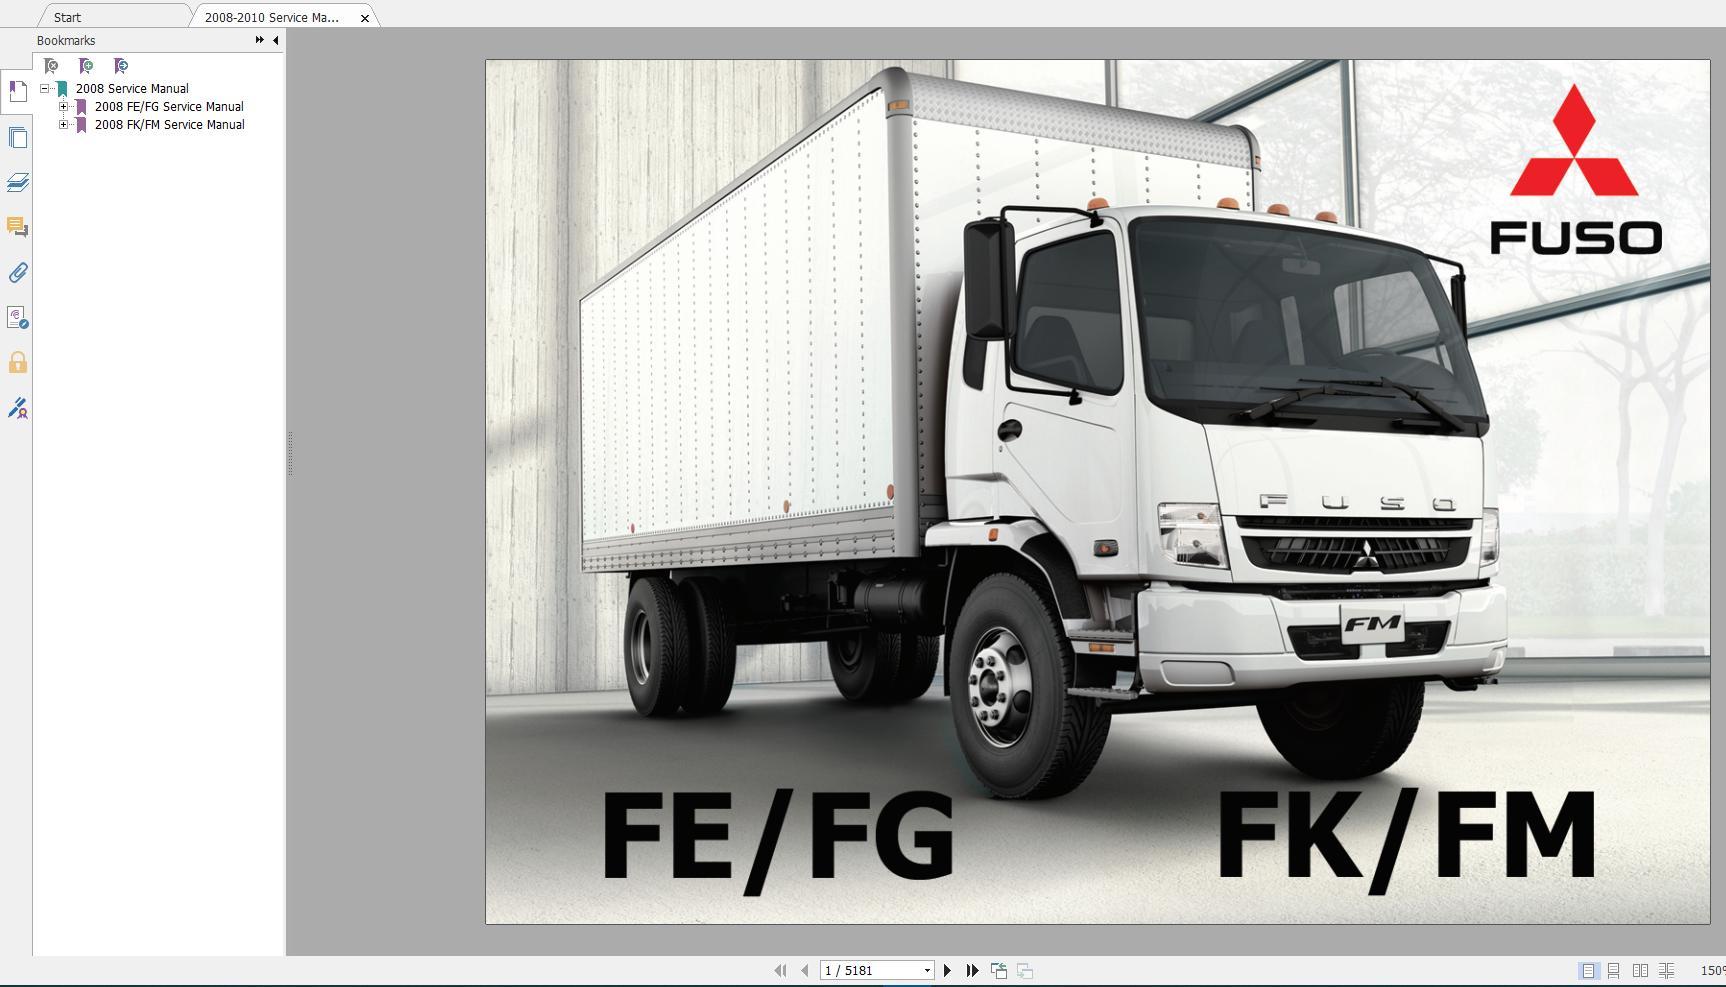 Mitsubishi_Truck_Fuso_2016_Service_Manual_Full_DVD9